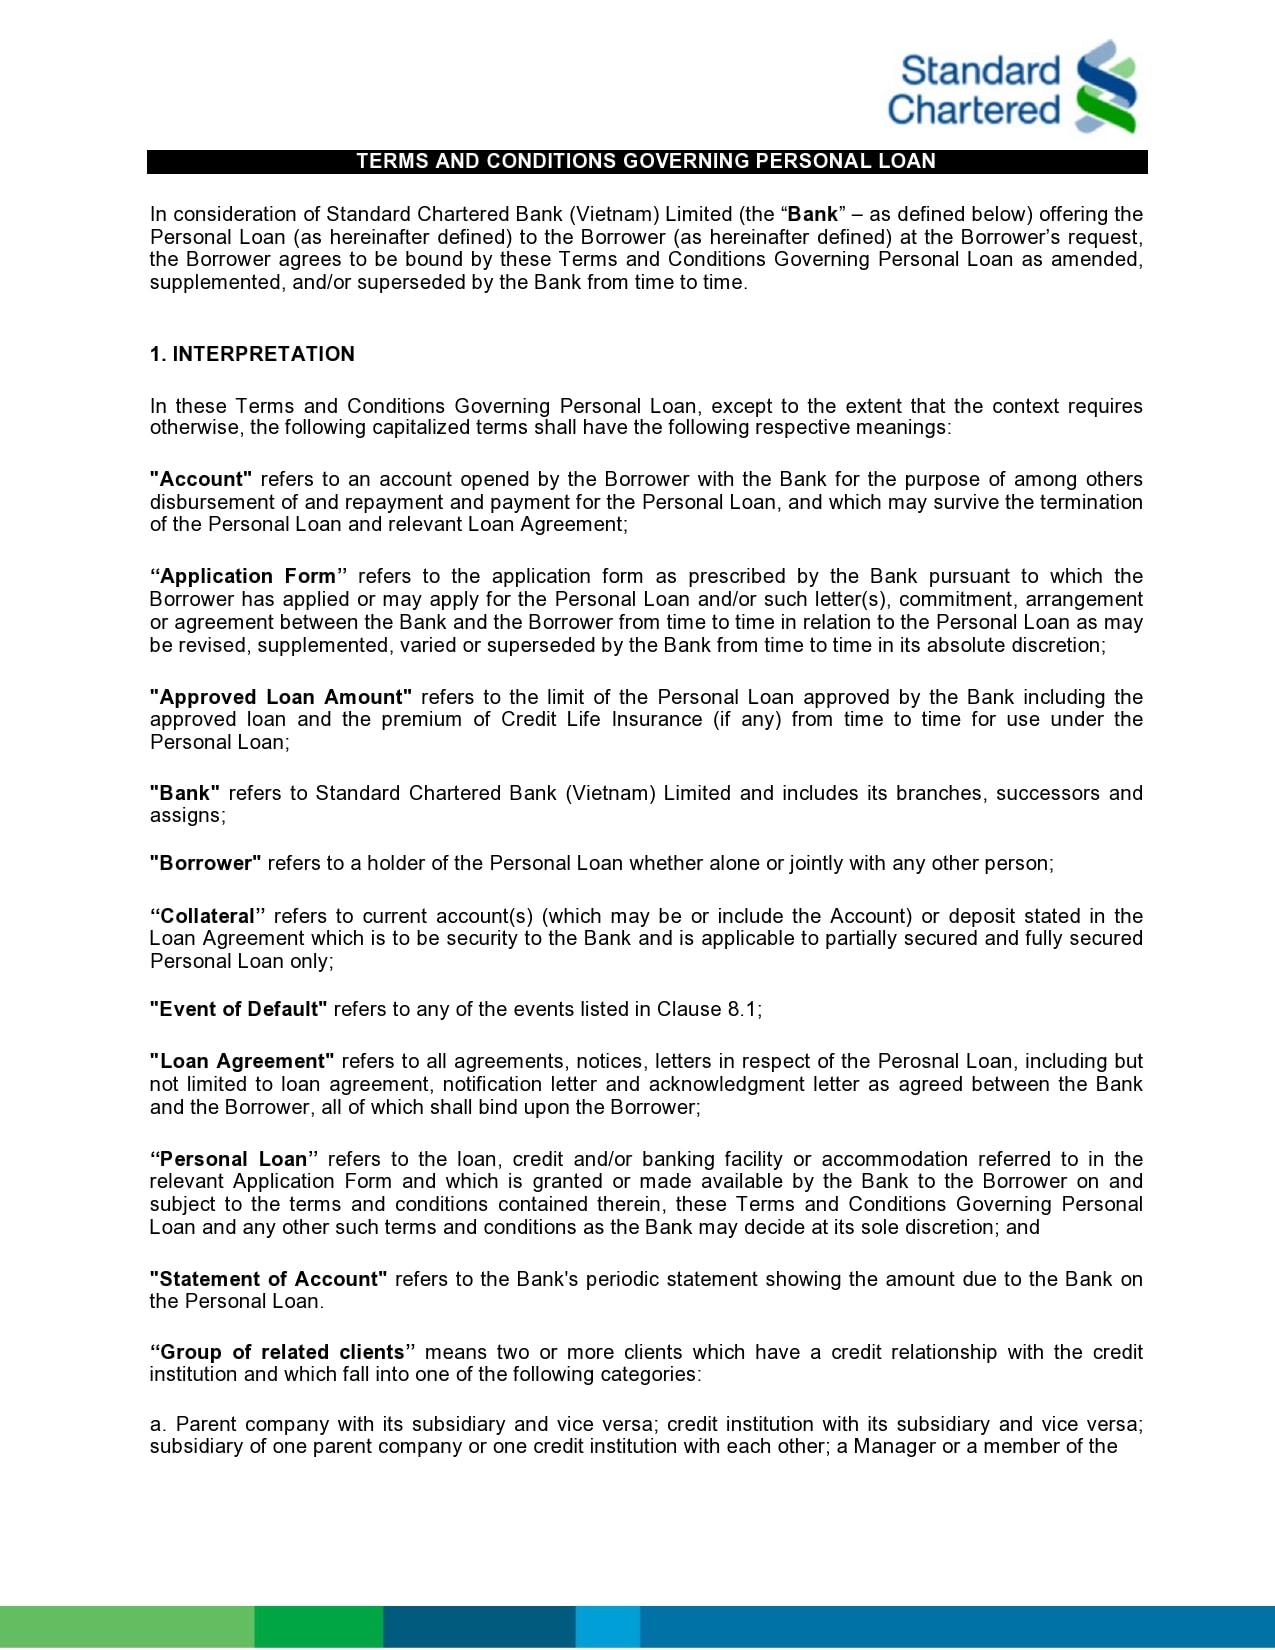 personal loan template 26